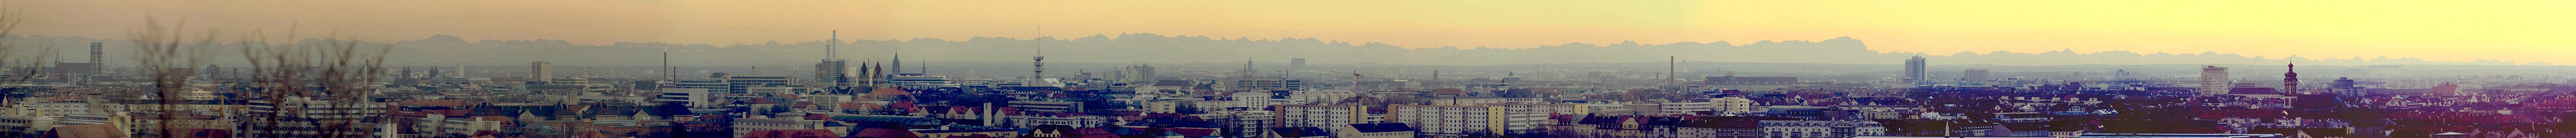 München Blick vom Olympiaberg